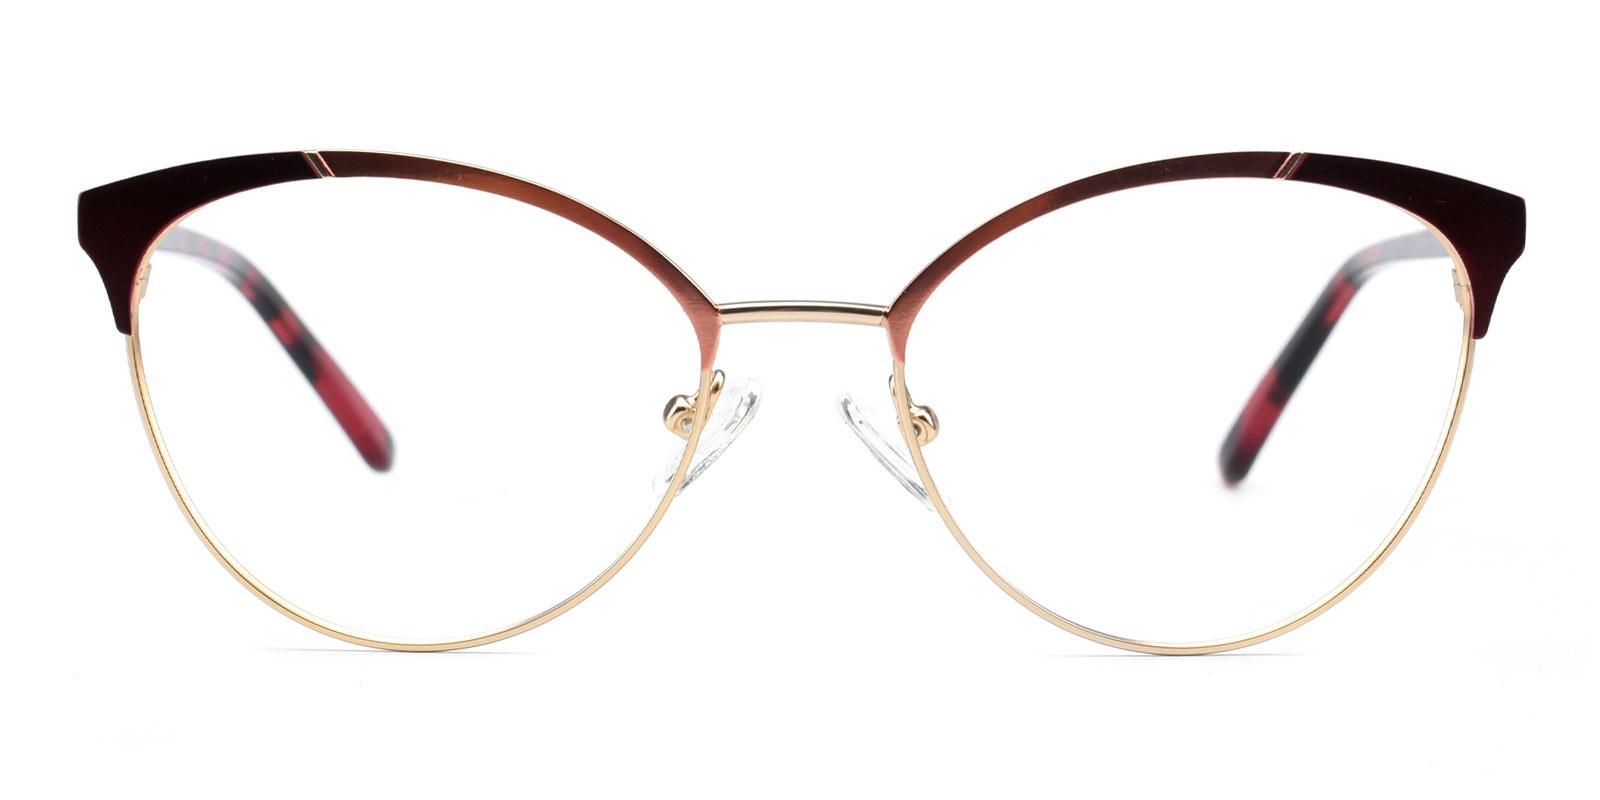 Hobbit-Red-Cat-Metal-Eyeglasses-additional2